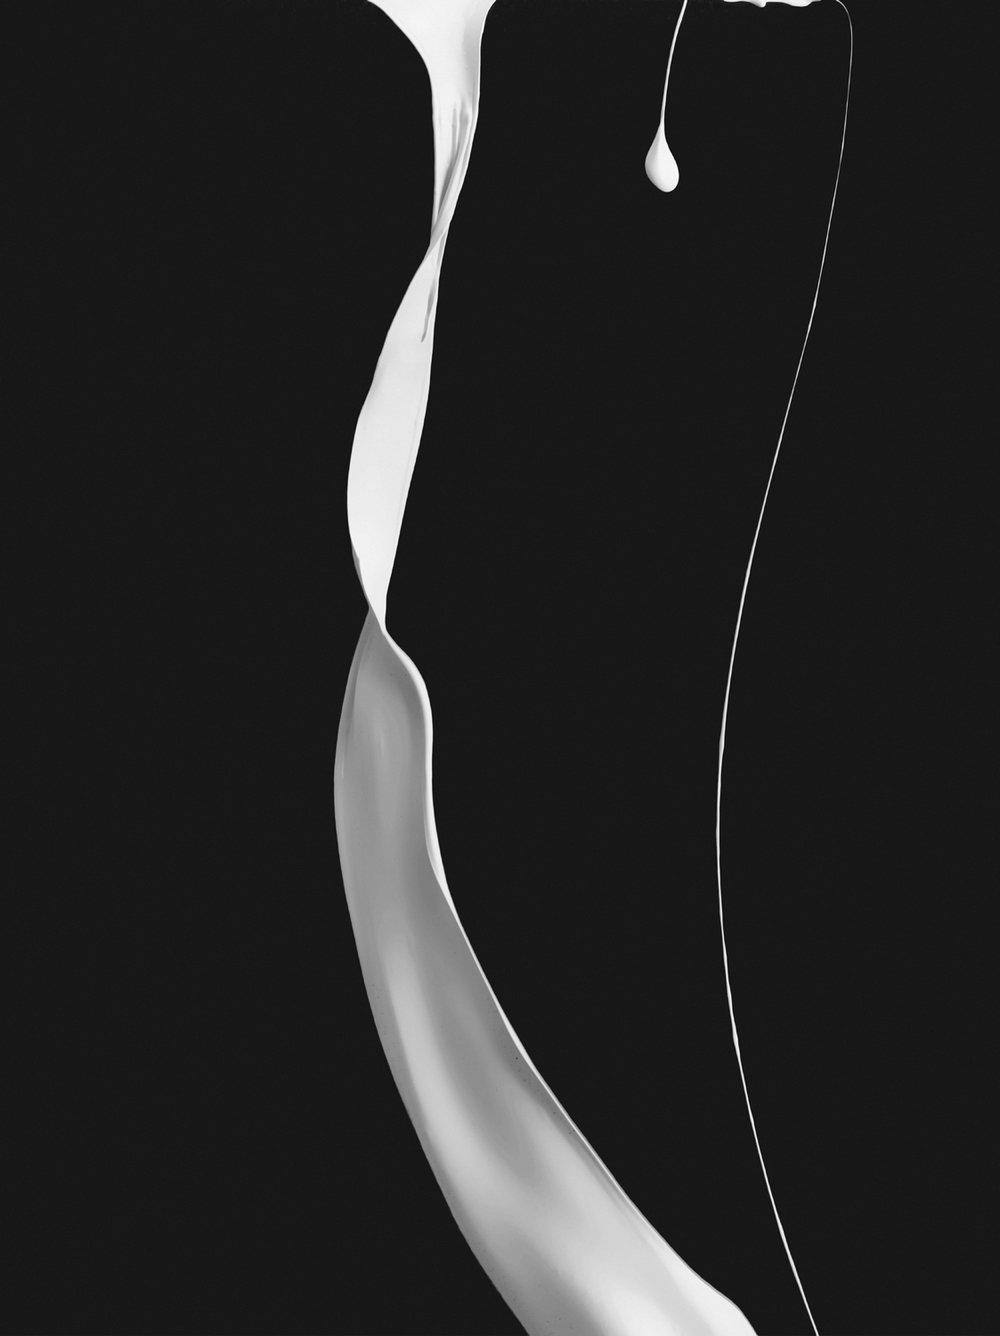 Lux-Liquid-Motion-Photography-High-Speed-Portfolio-10.jpg